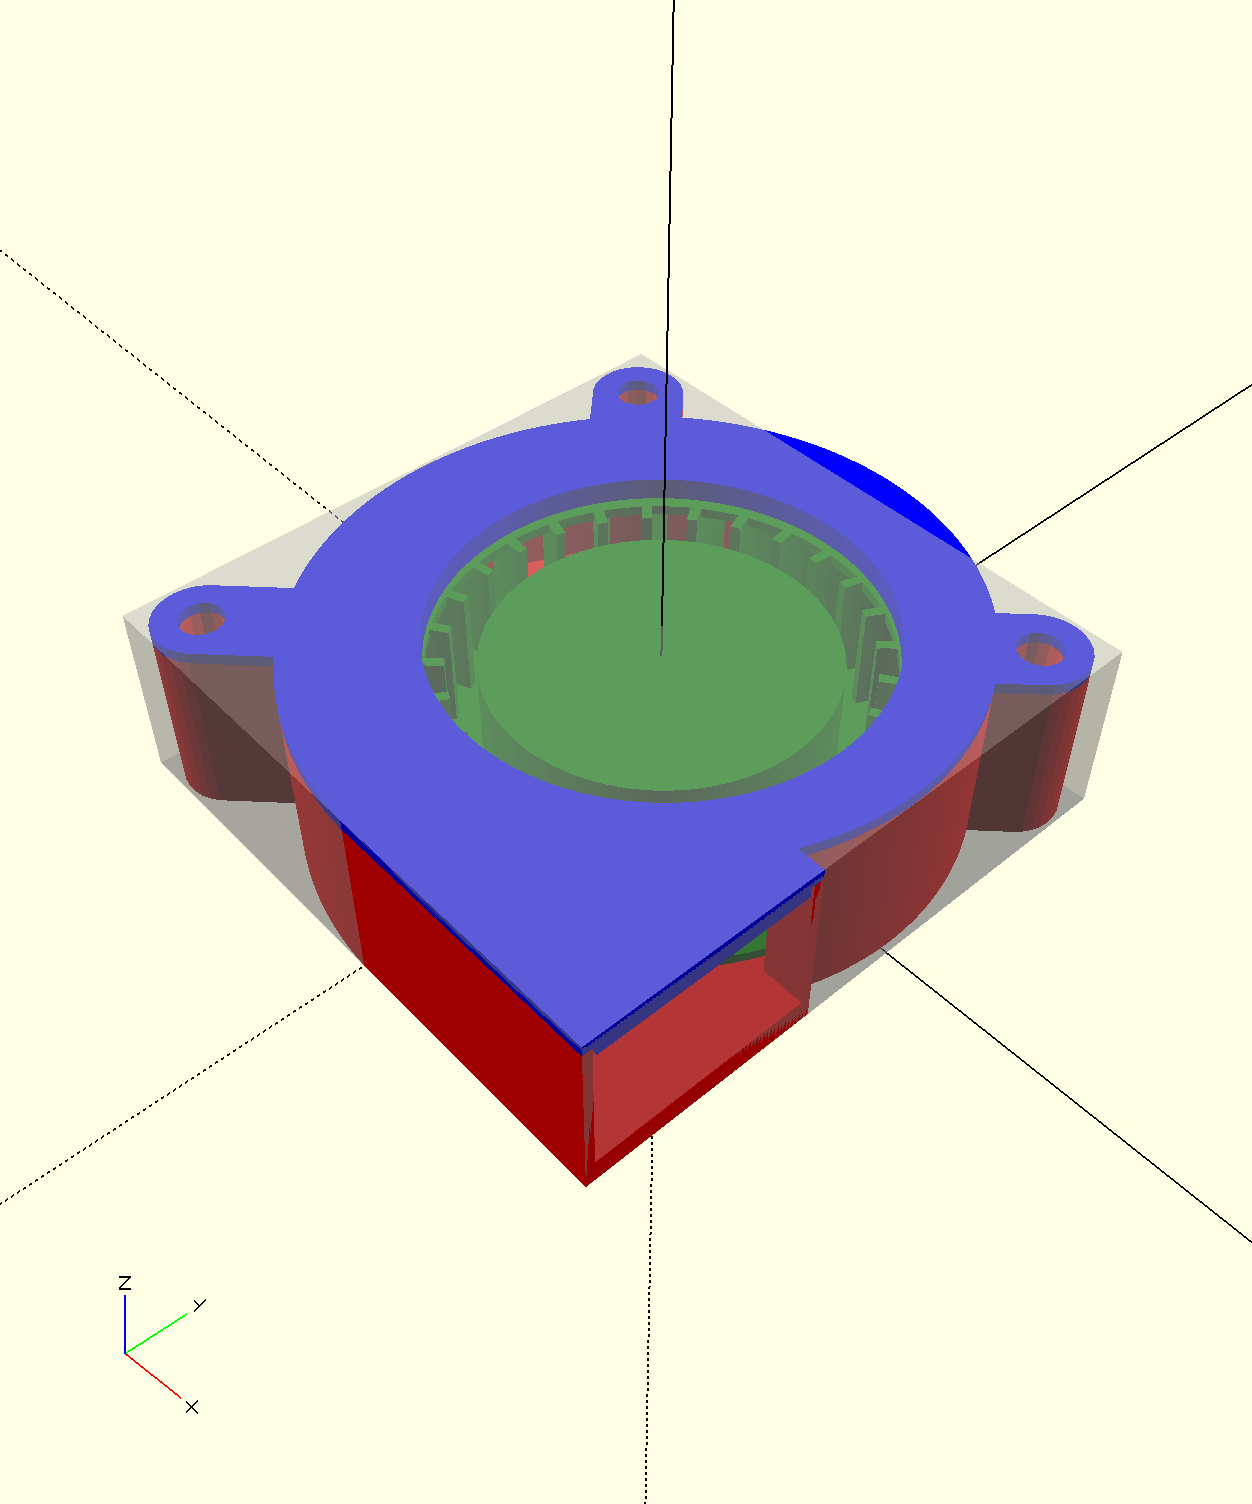 Centrifugal Fan By Jinhwanlazy Thingiverse Wiring Diagram Feb 2 2015 View Original